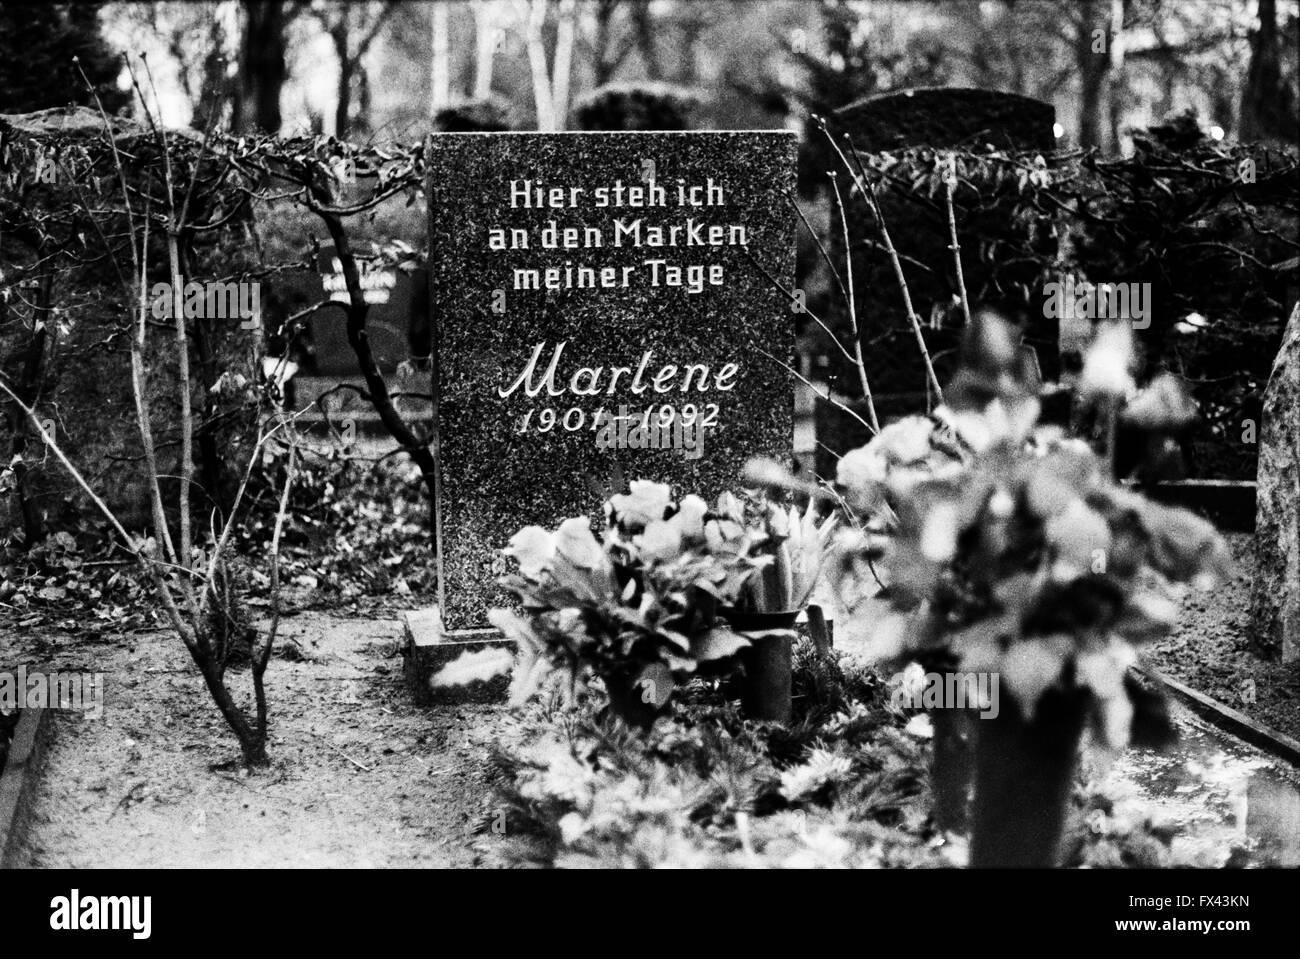 Archive image of the grave of Marlene Dietrich,  1901-1992, Friedenau cemetery, Stubenrauchstrasse, Berlin, March - Stock Image